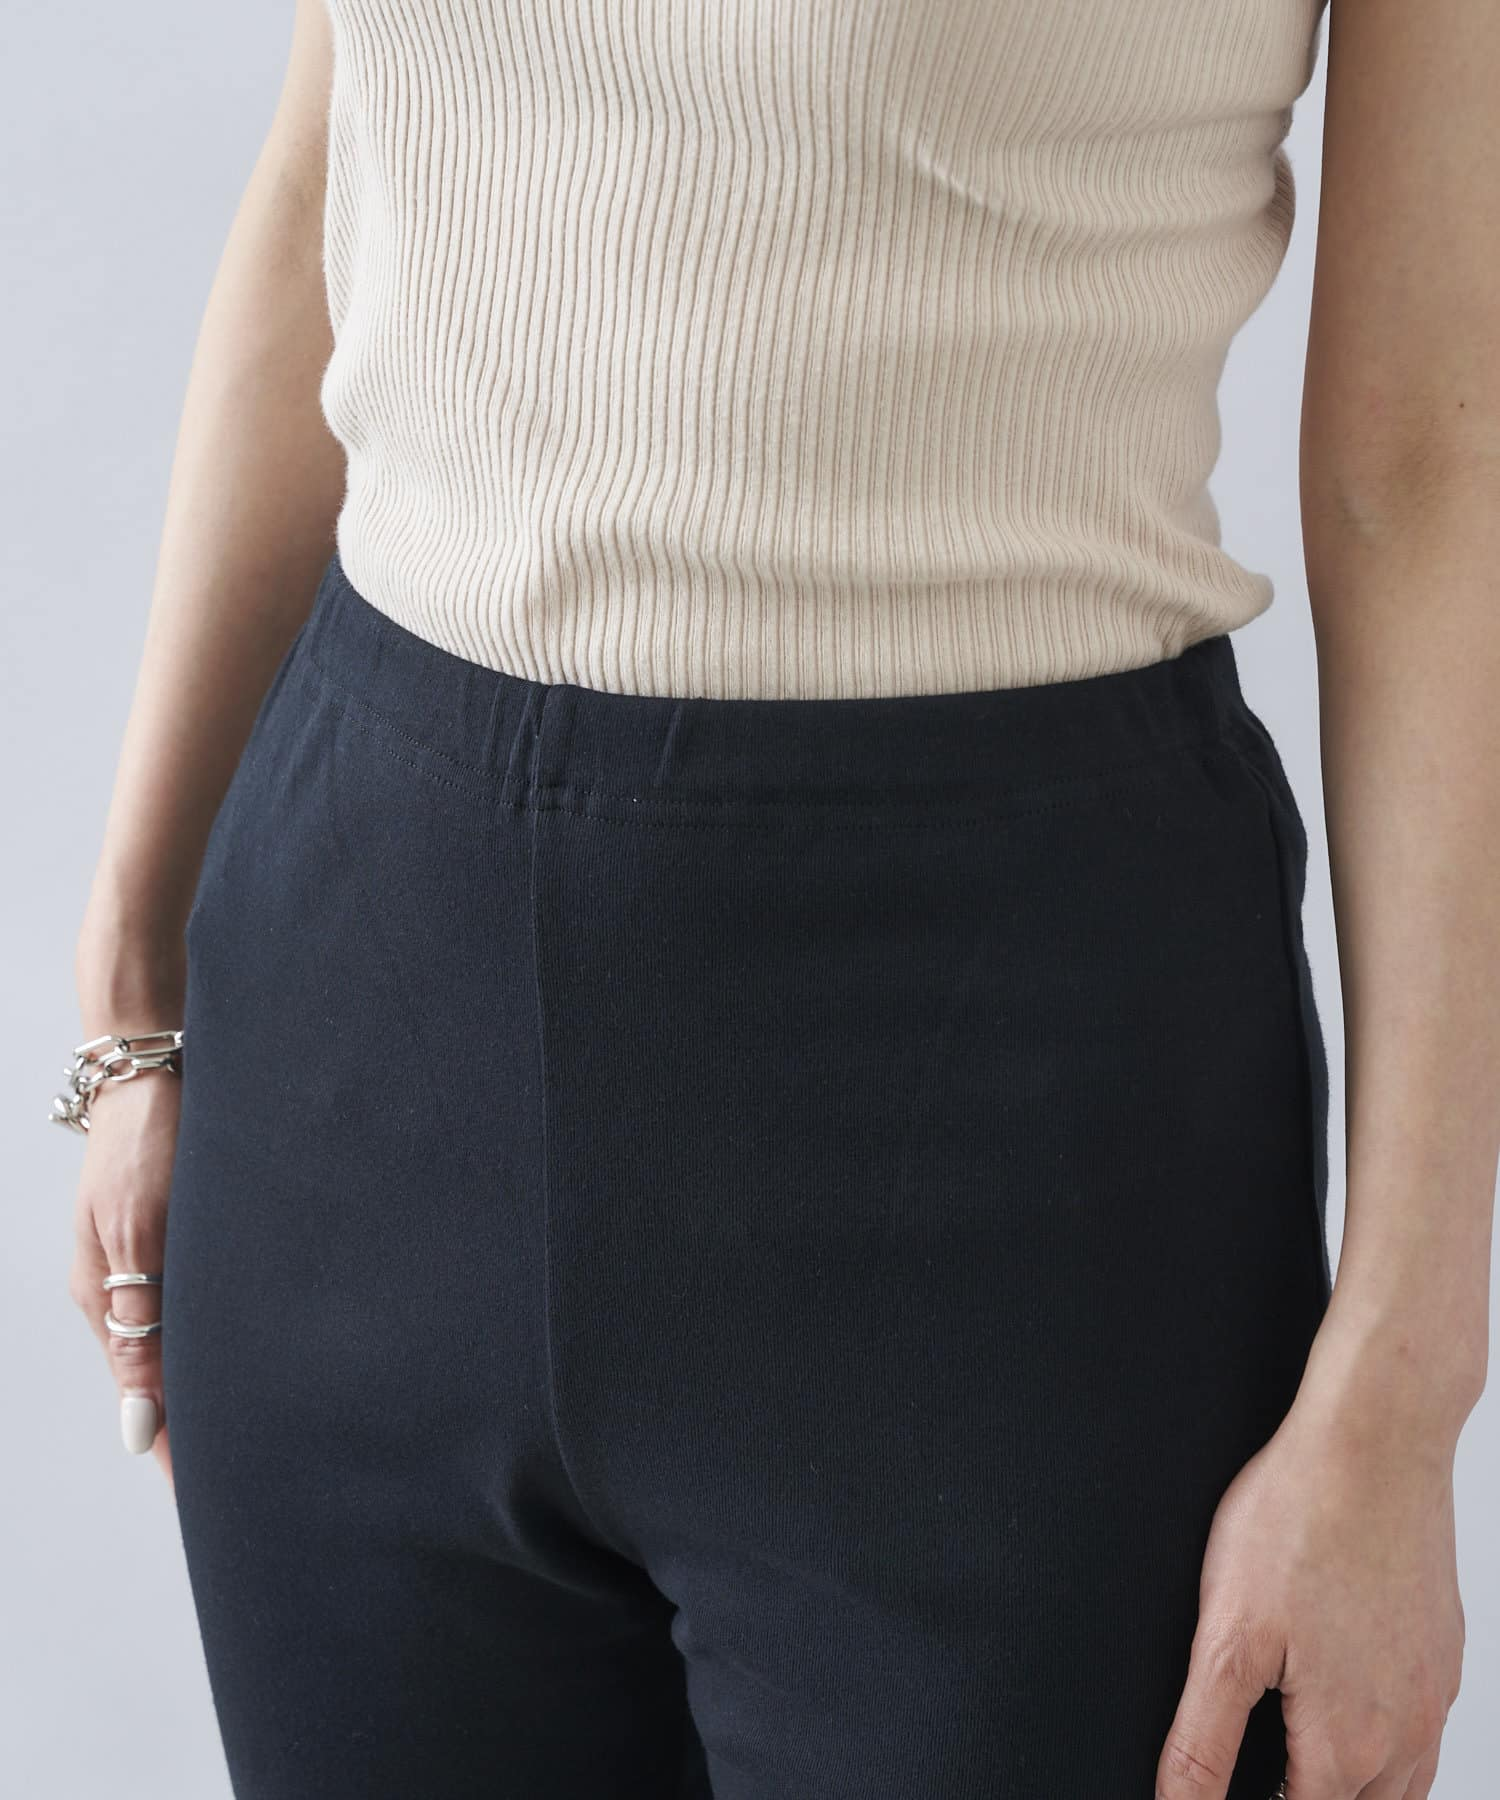 DOUDOU(ドゥドゥ) 【追加予約】【WEB限定】レギンス付スカート